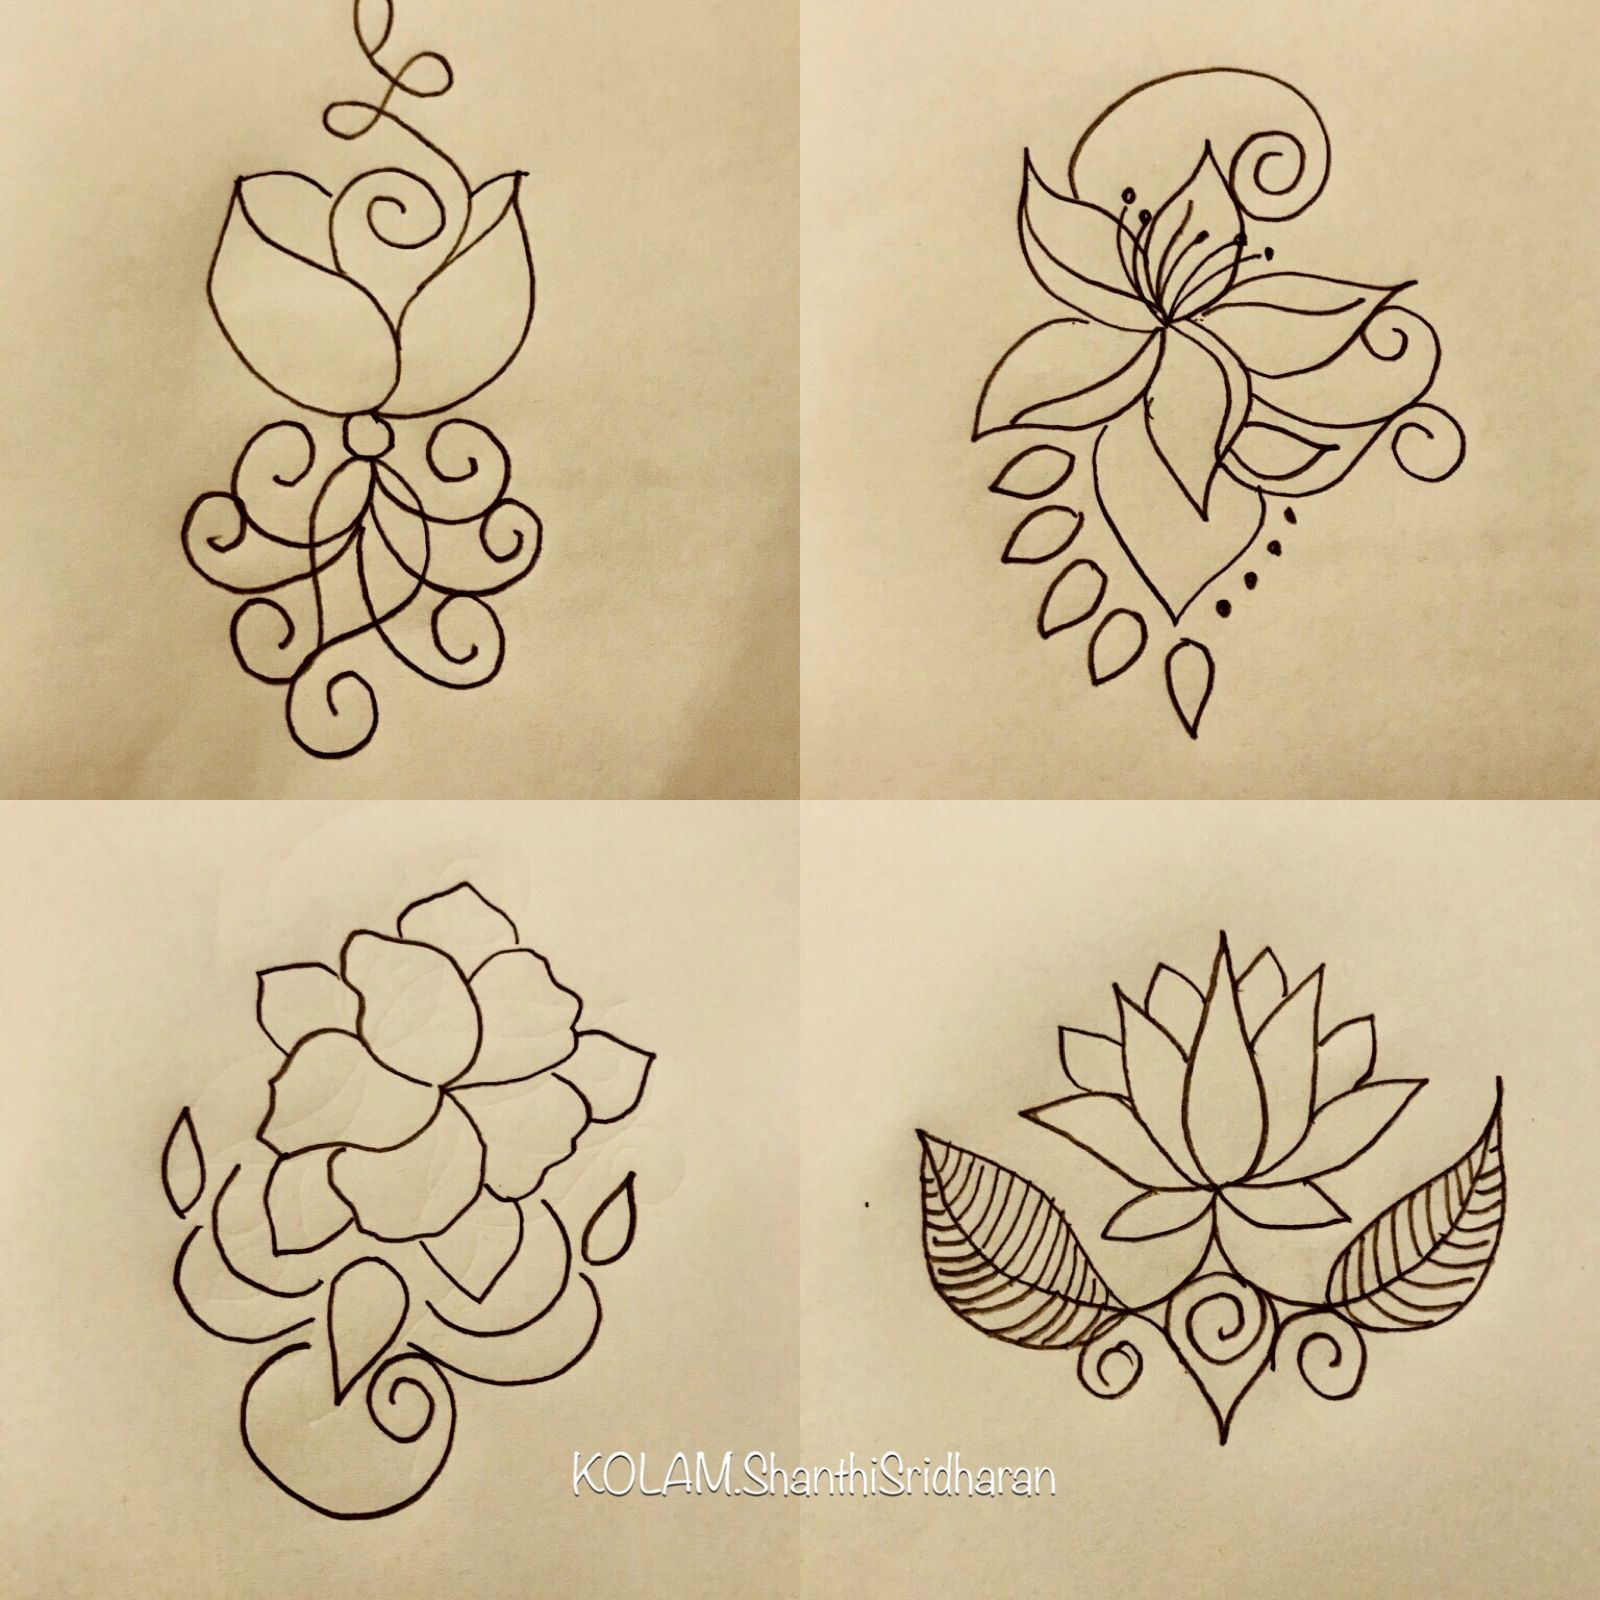 Pin By Shanthi Sridharan Kolam On Simpleart Simpledesign Easyart